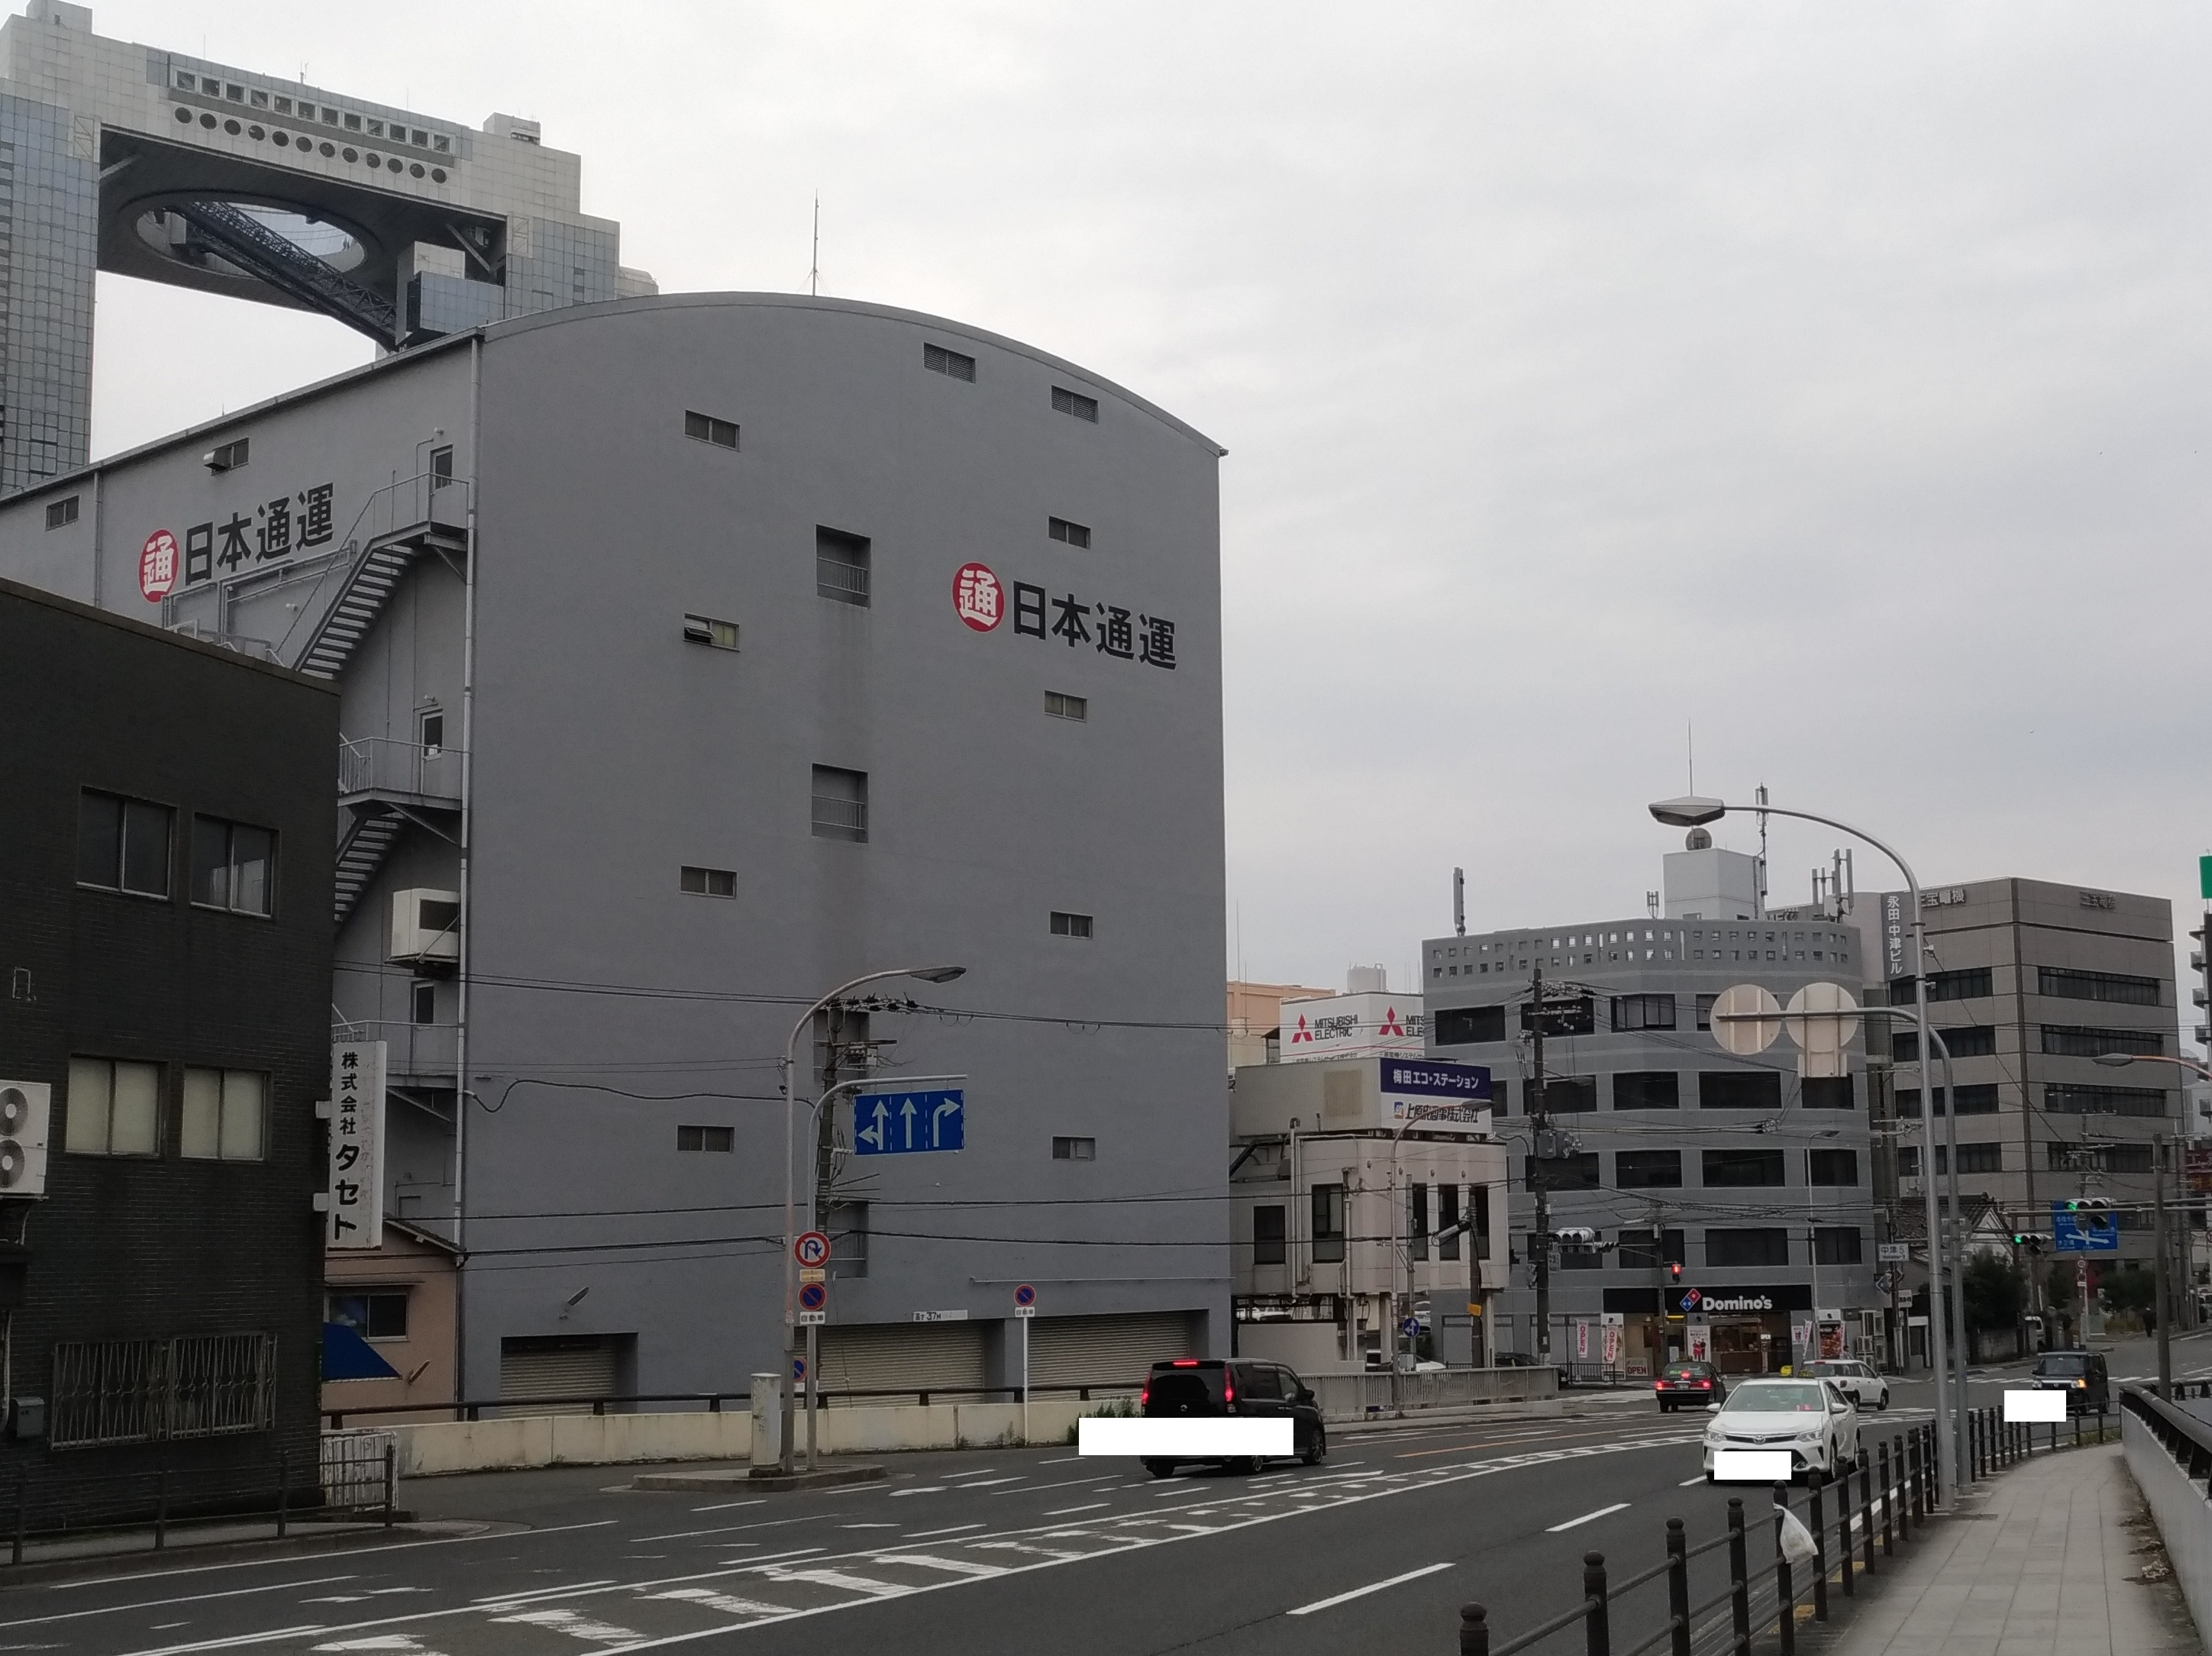 osaka_shin_umeda_domino_piza.jpg